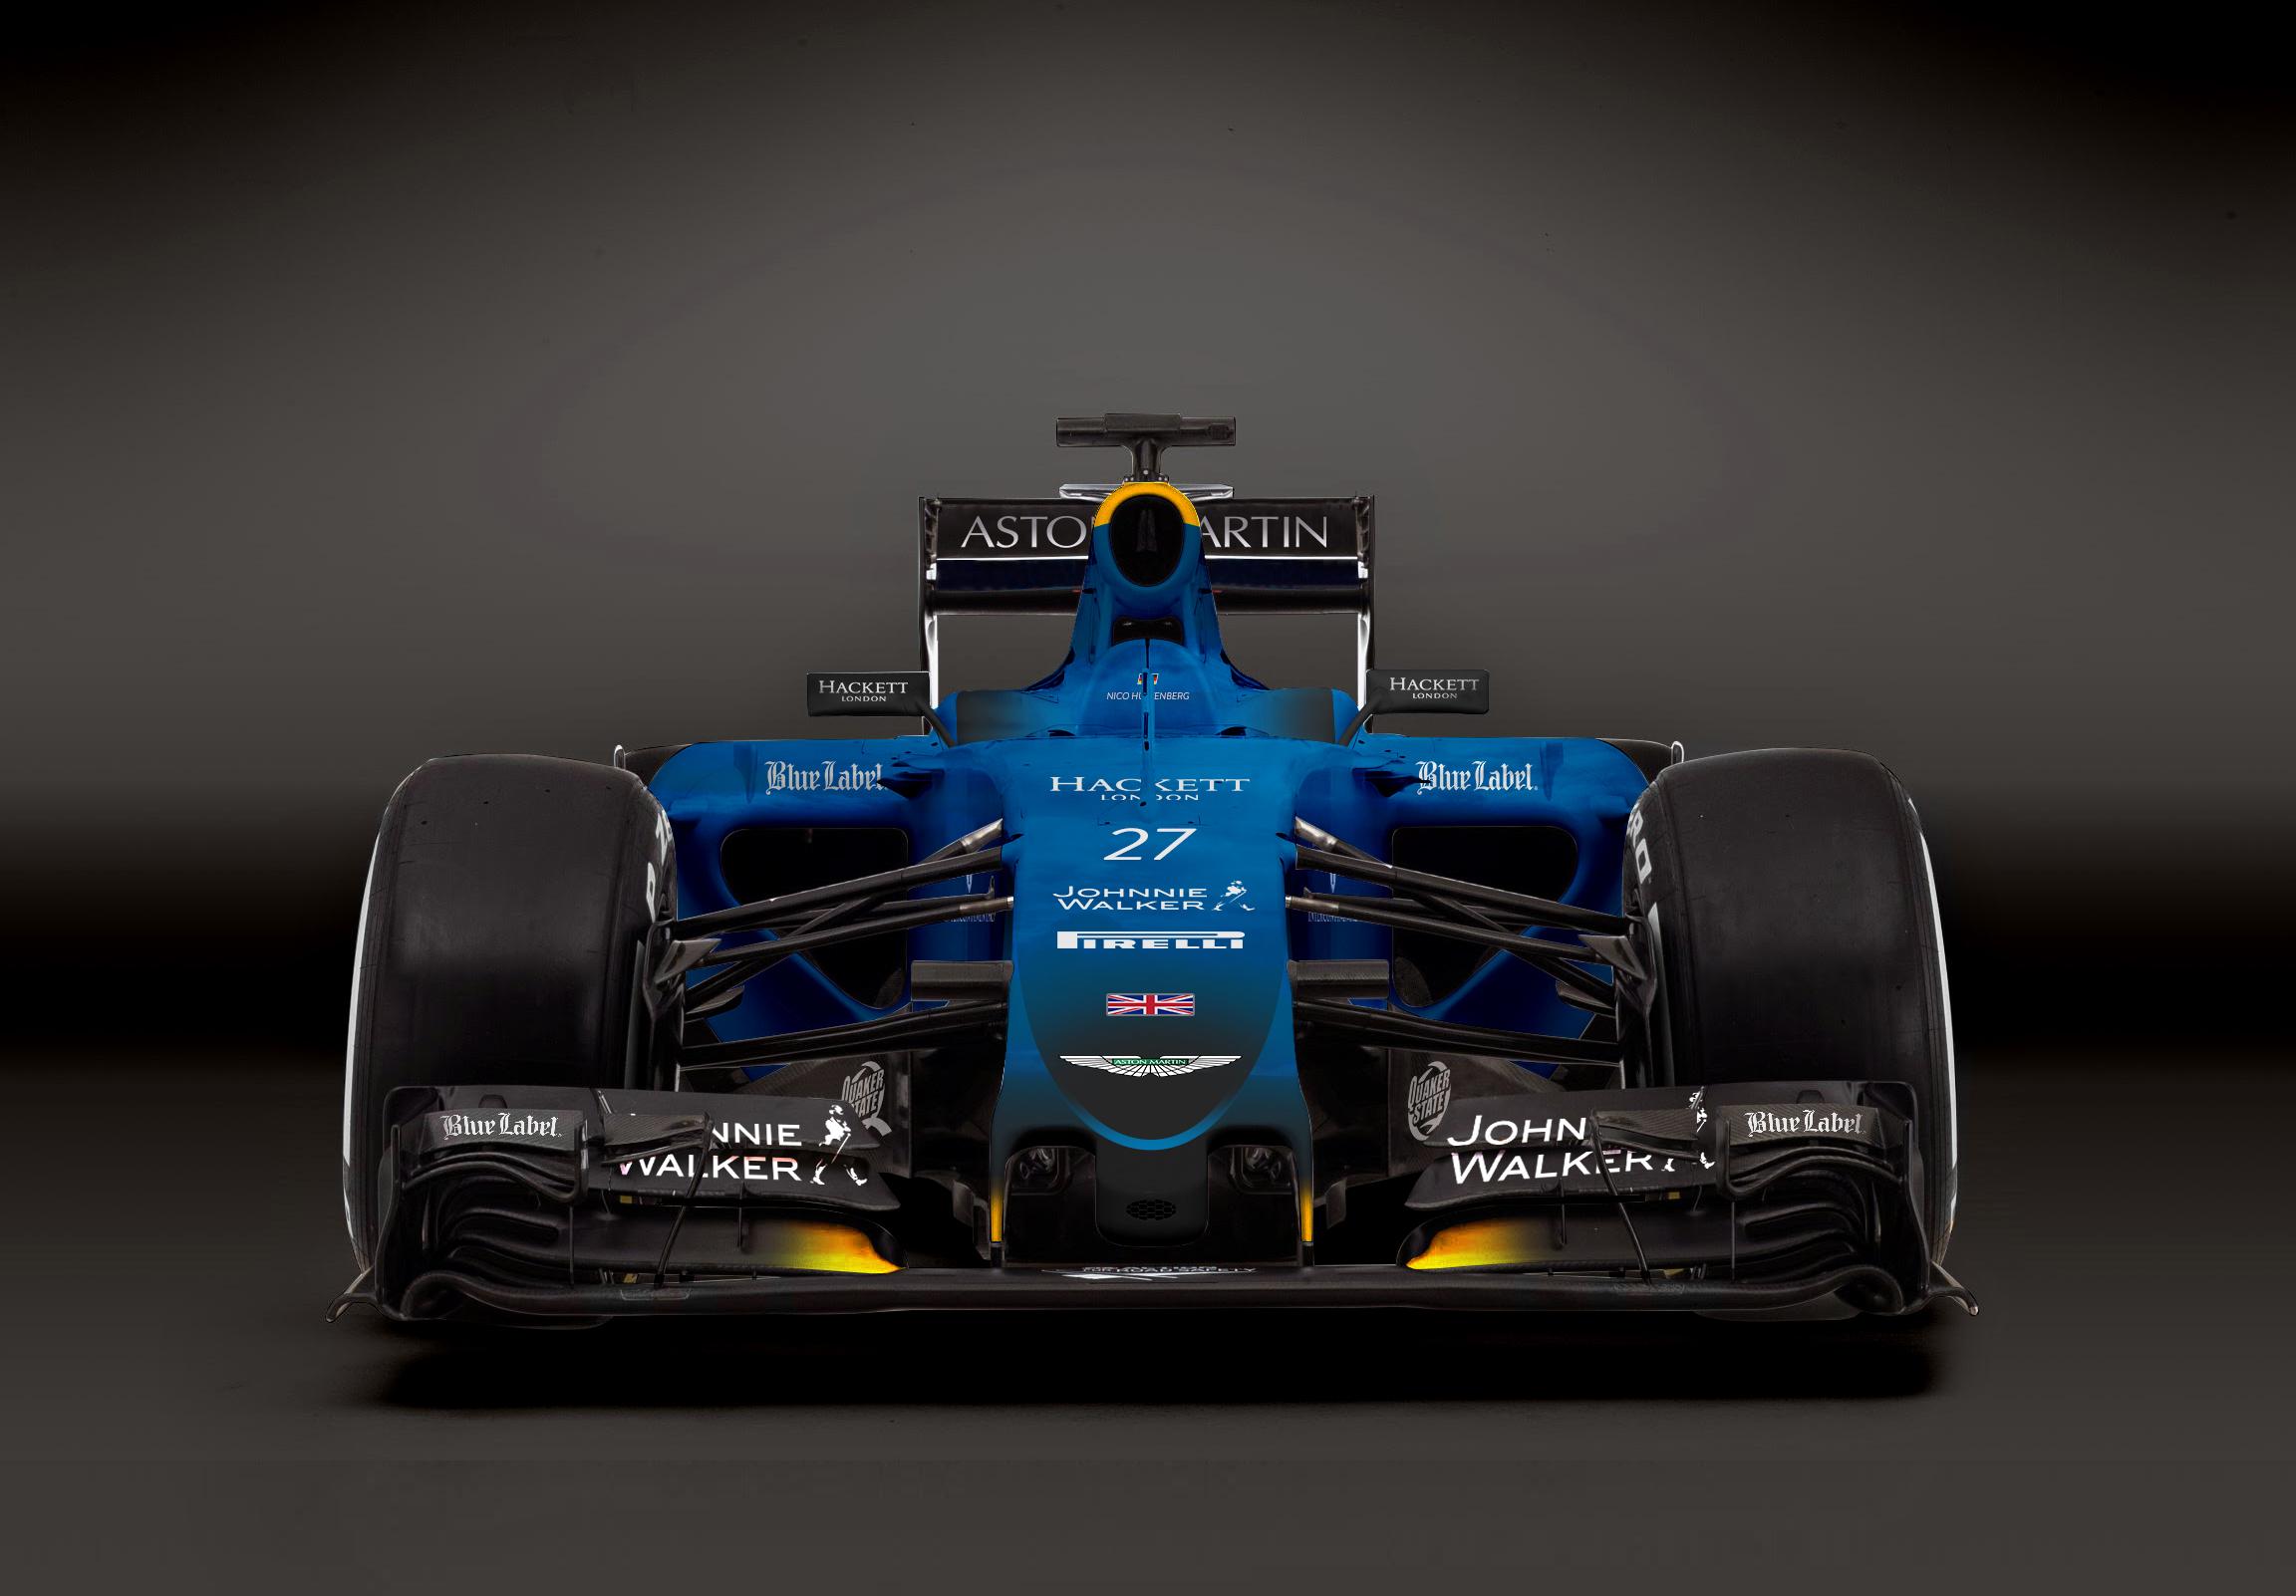 Formel 1 Team Aston Martin